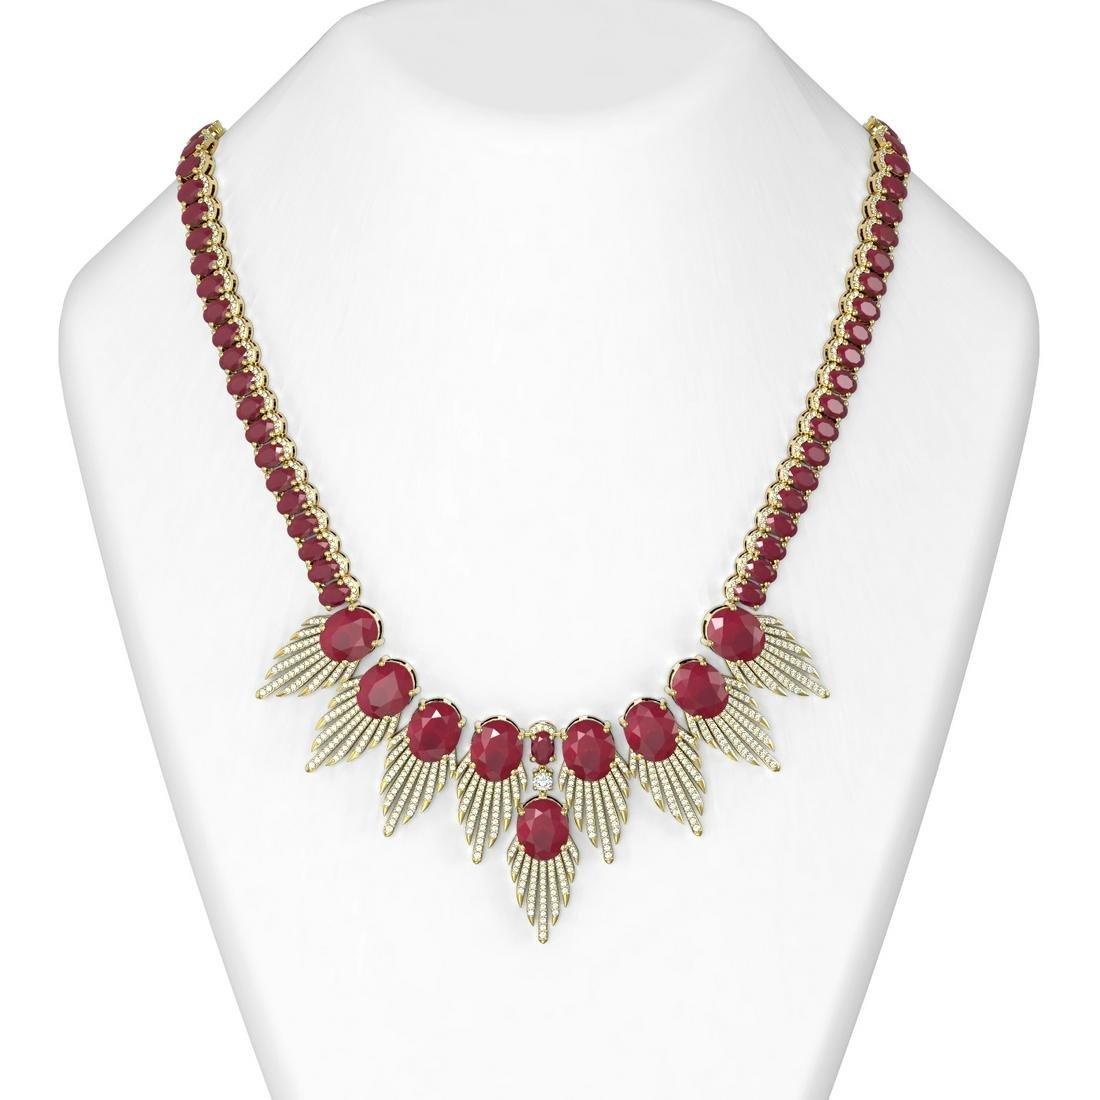 88.87 ctw Ruby & Diamond Necklace 18K Yellow Gold -